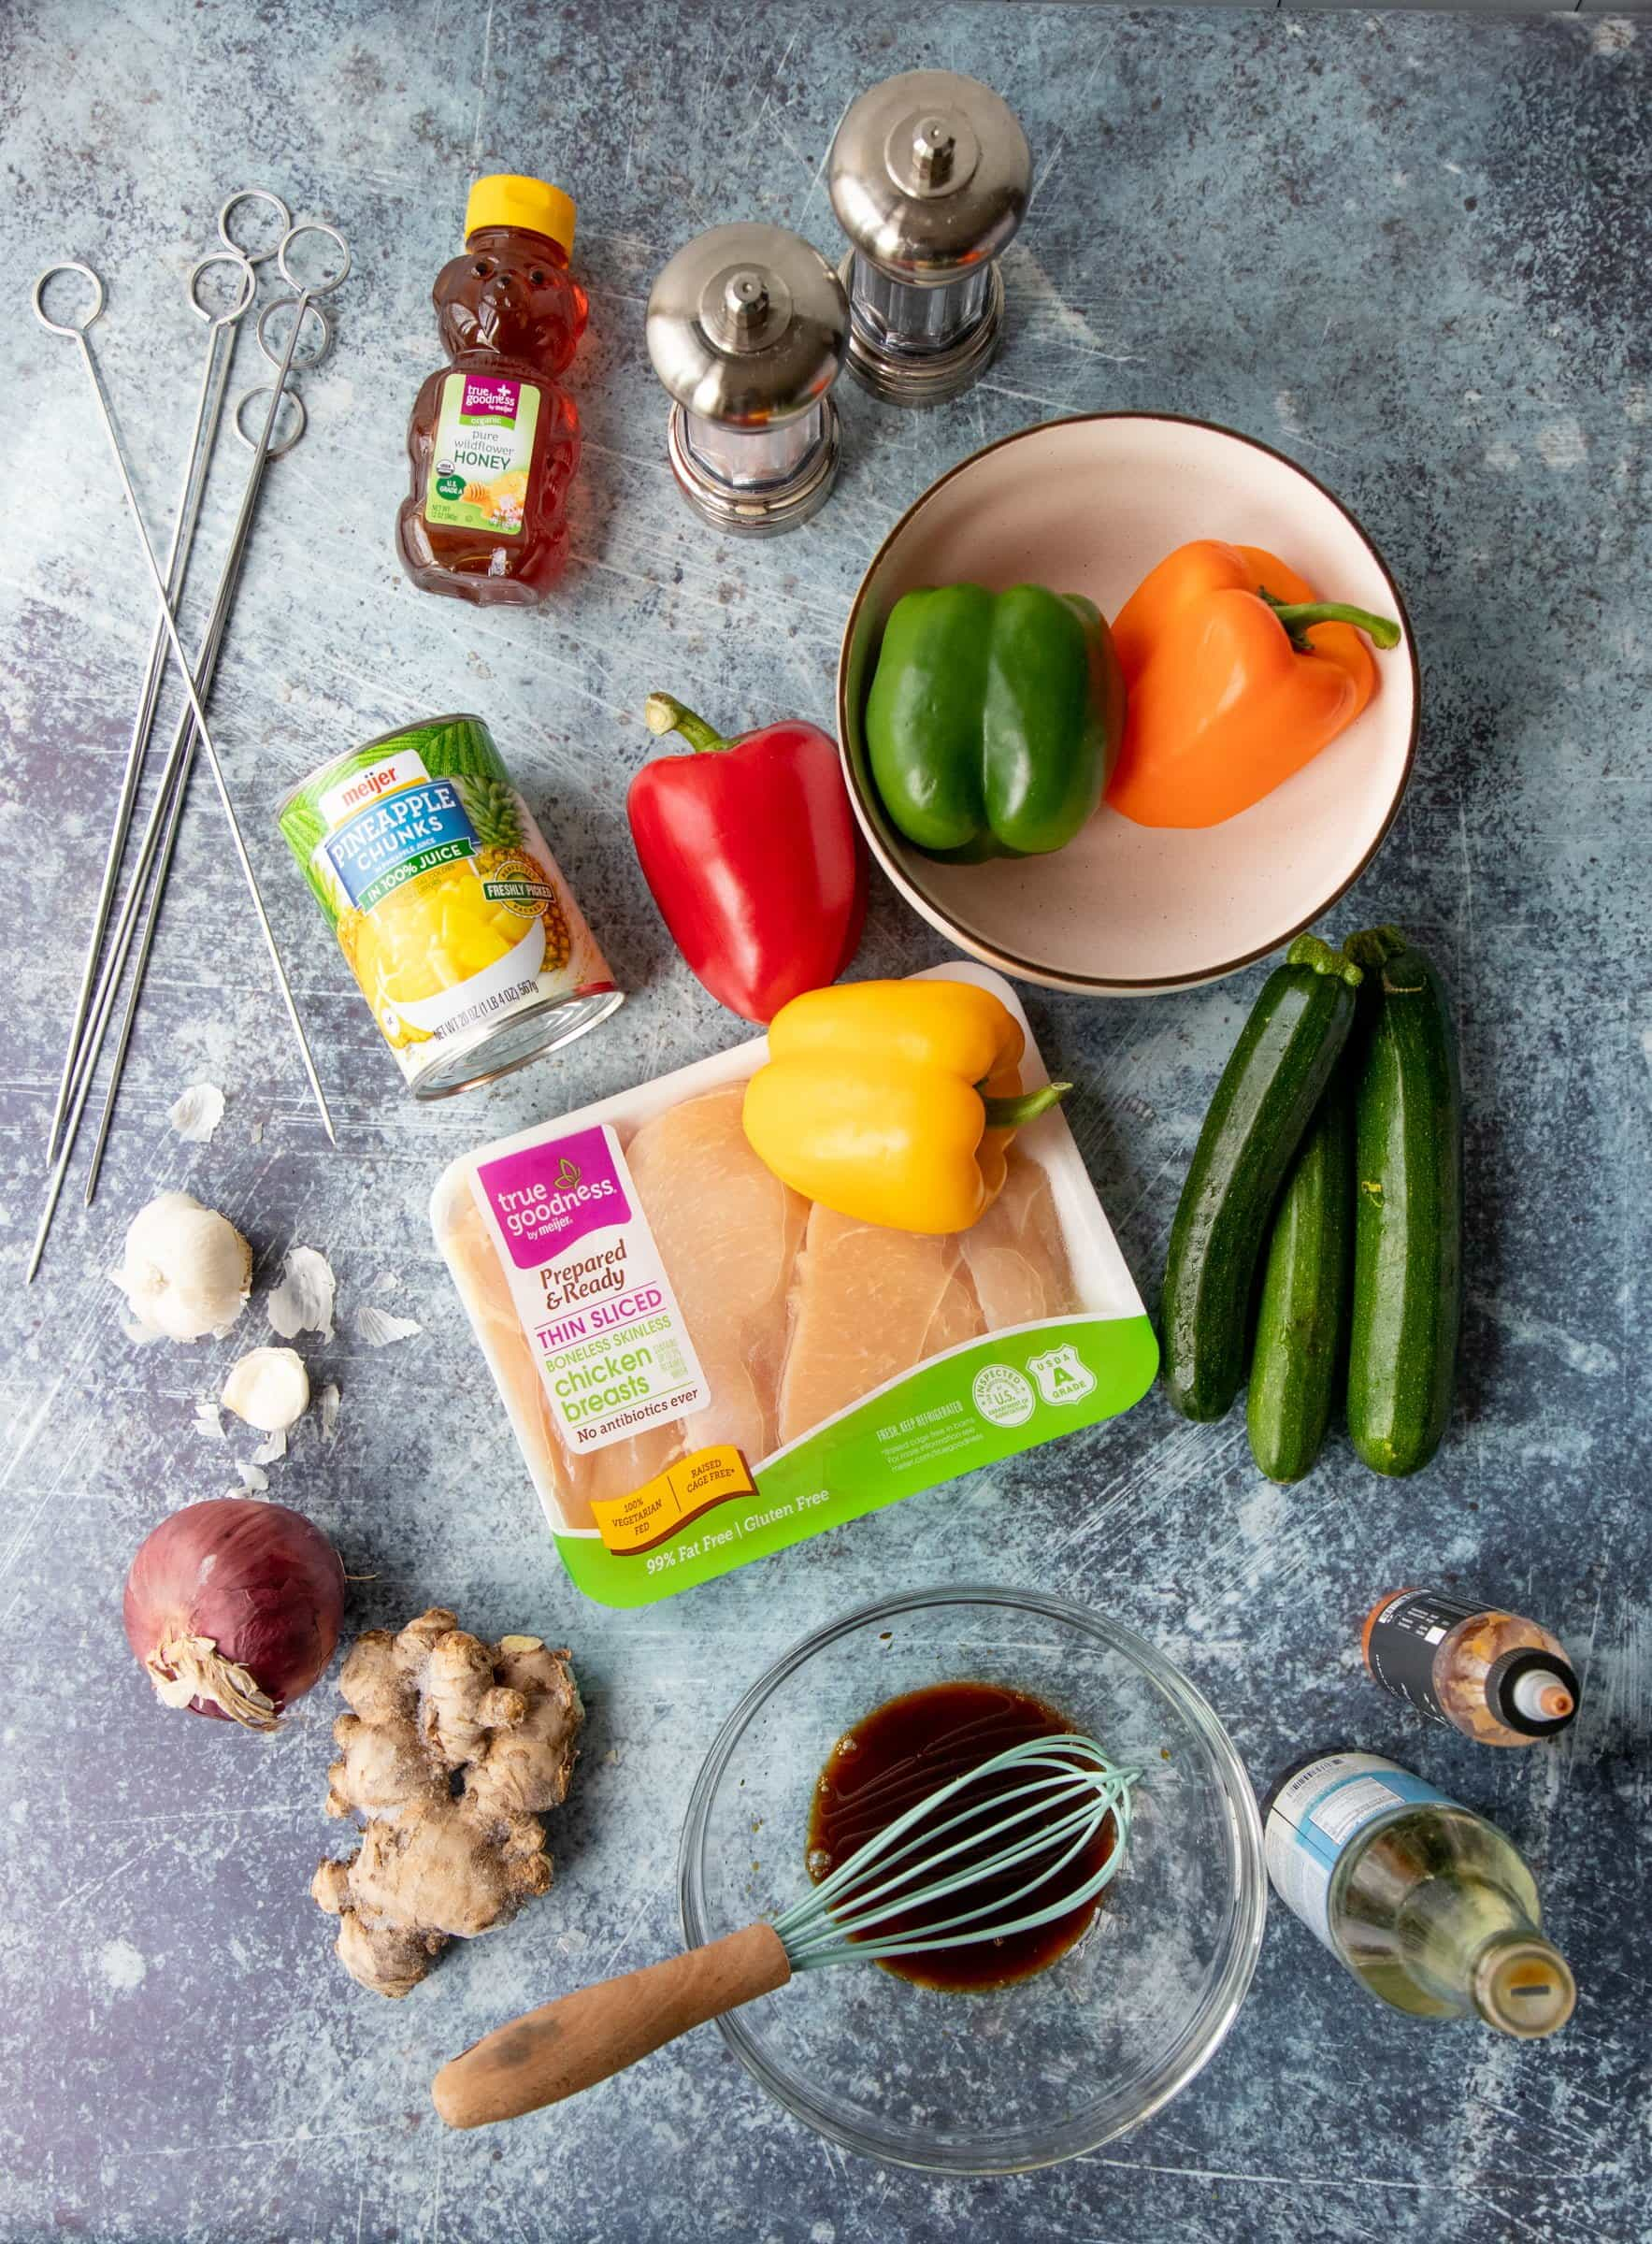 Ingredients for Grilled Chicken Kabobs - vegetables, chicken, pineapple, ginger, onion, honey, metal skewers